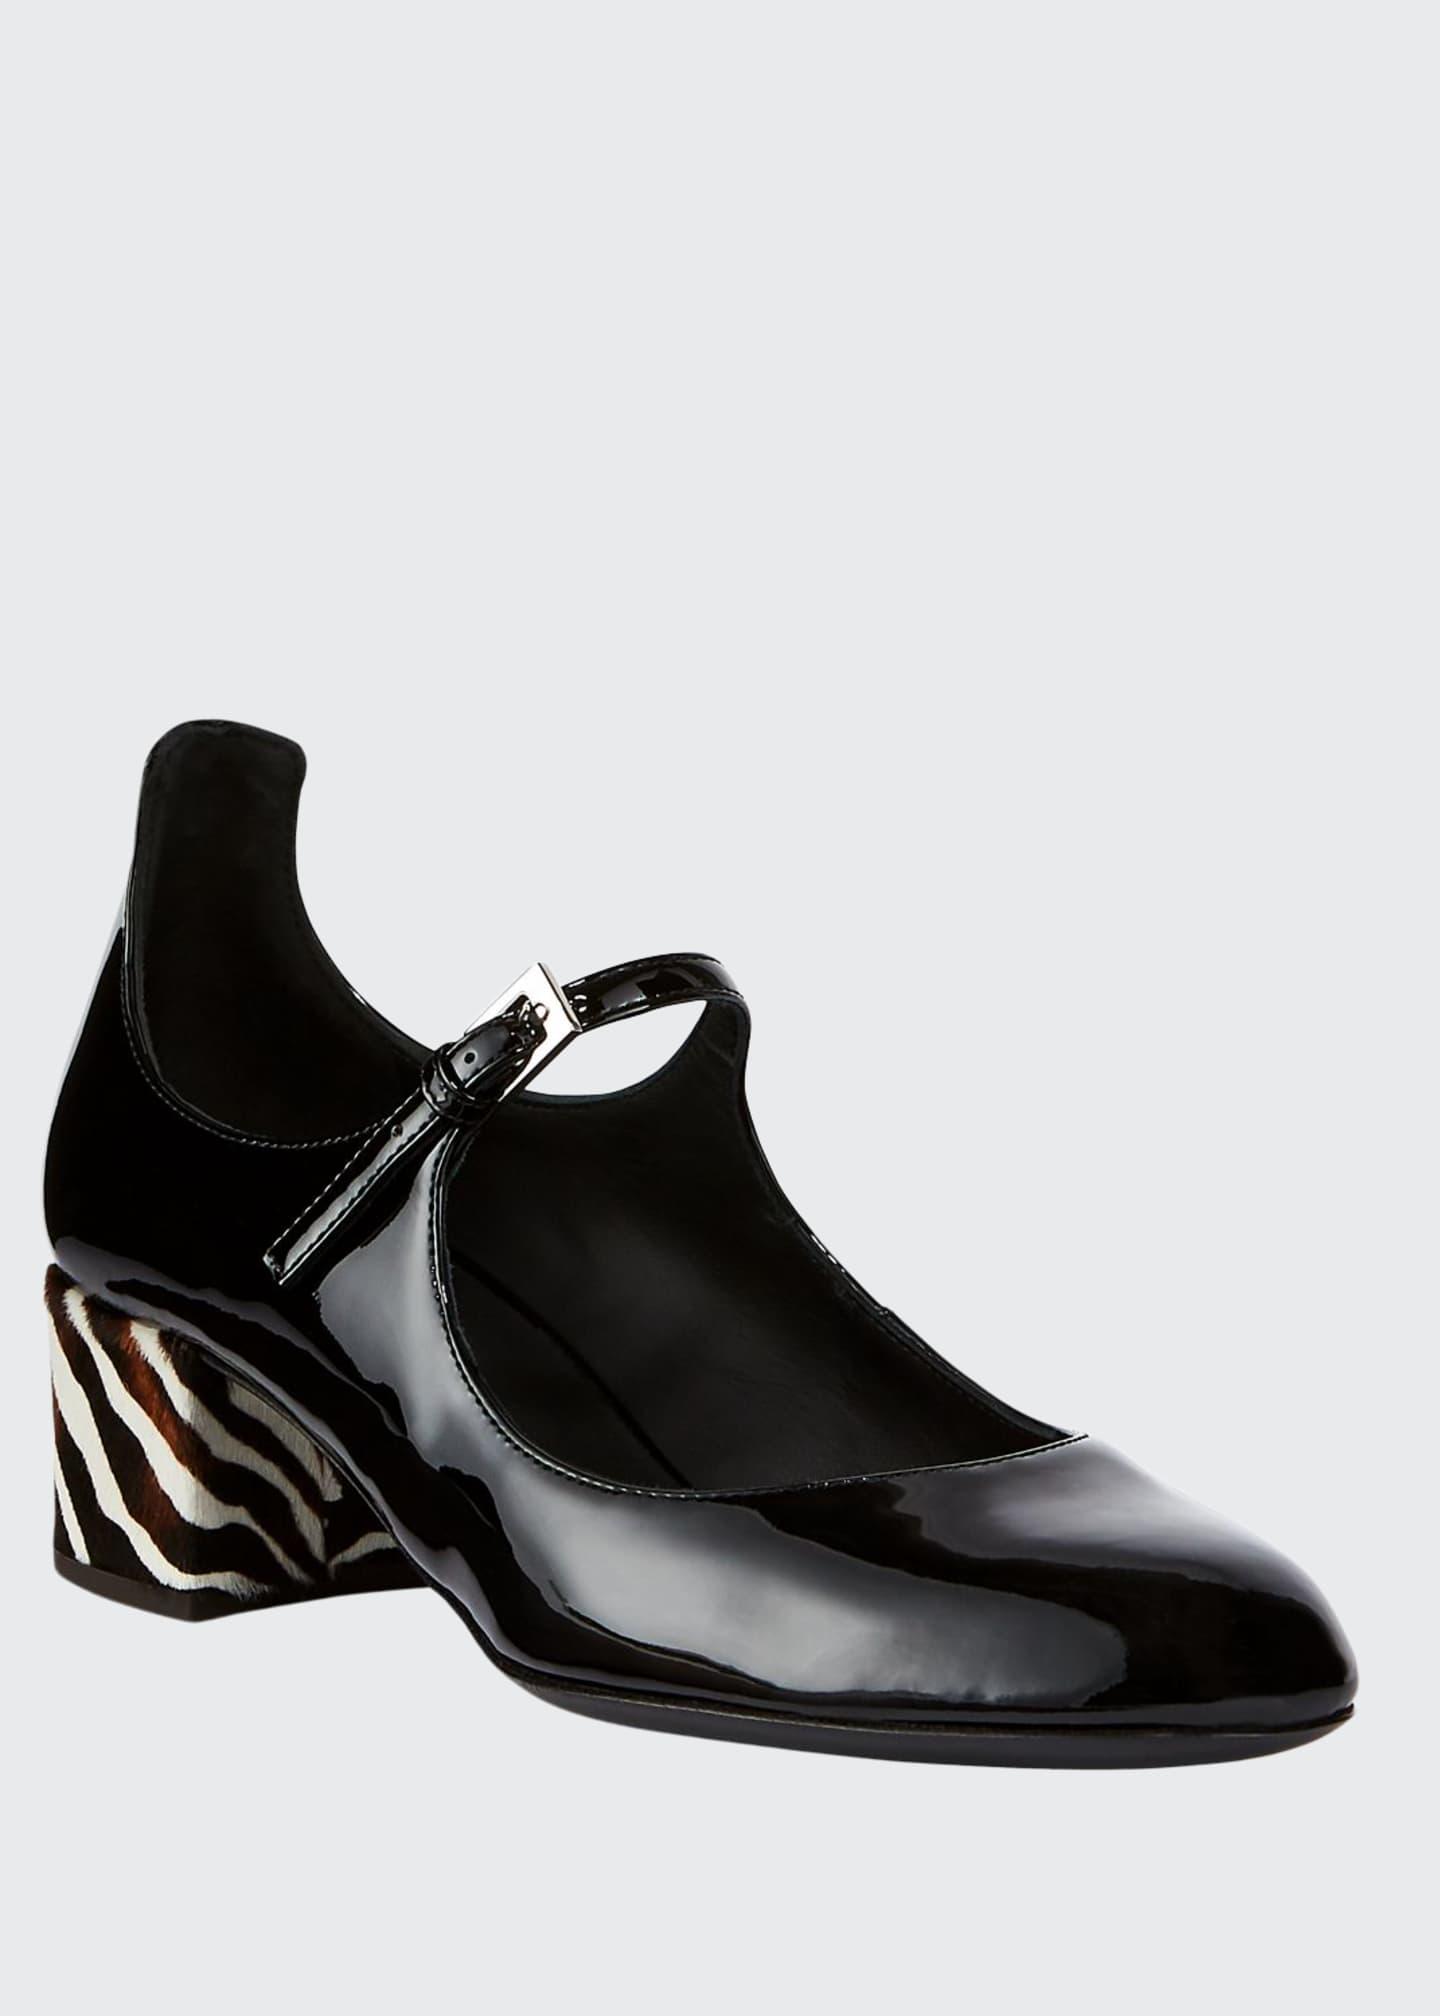 Giuseppe Zanotti Patent Leather Zebra Fur Mary Jane